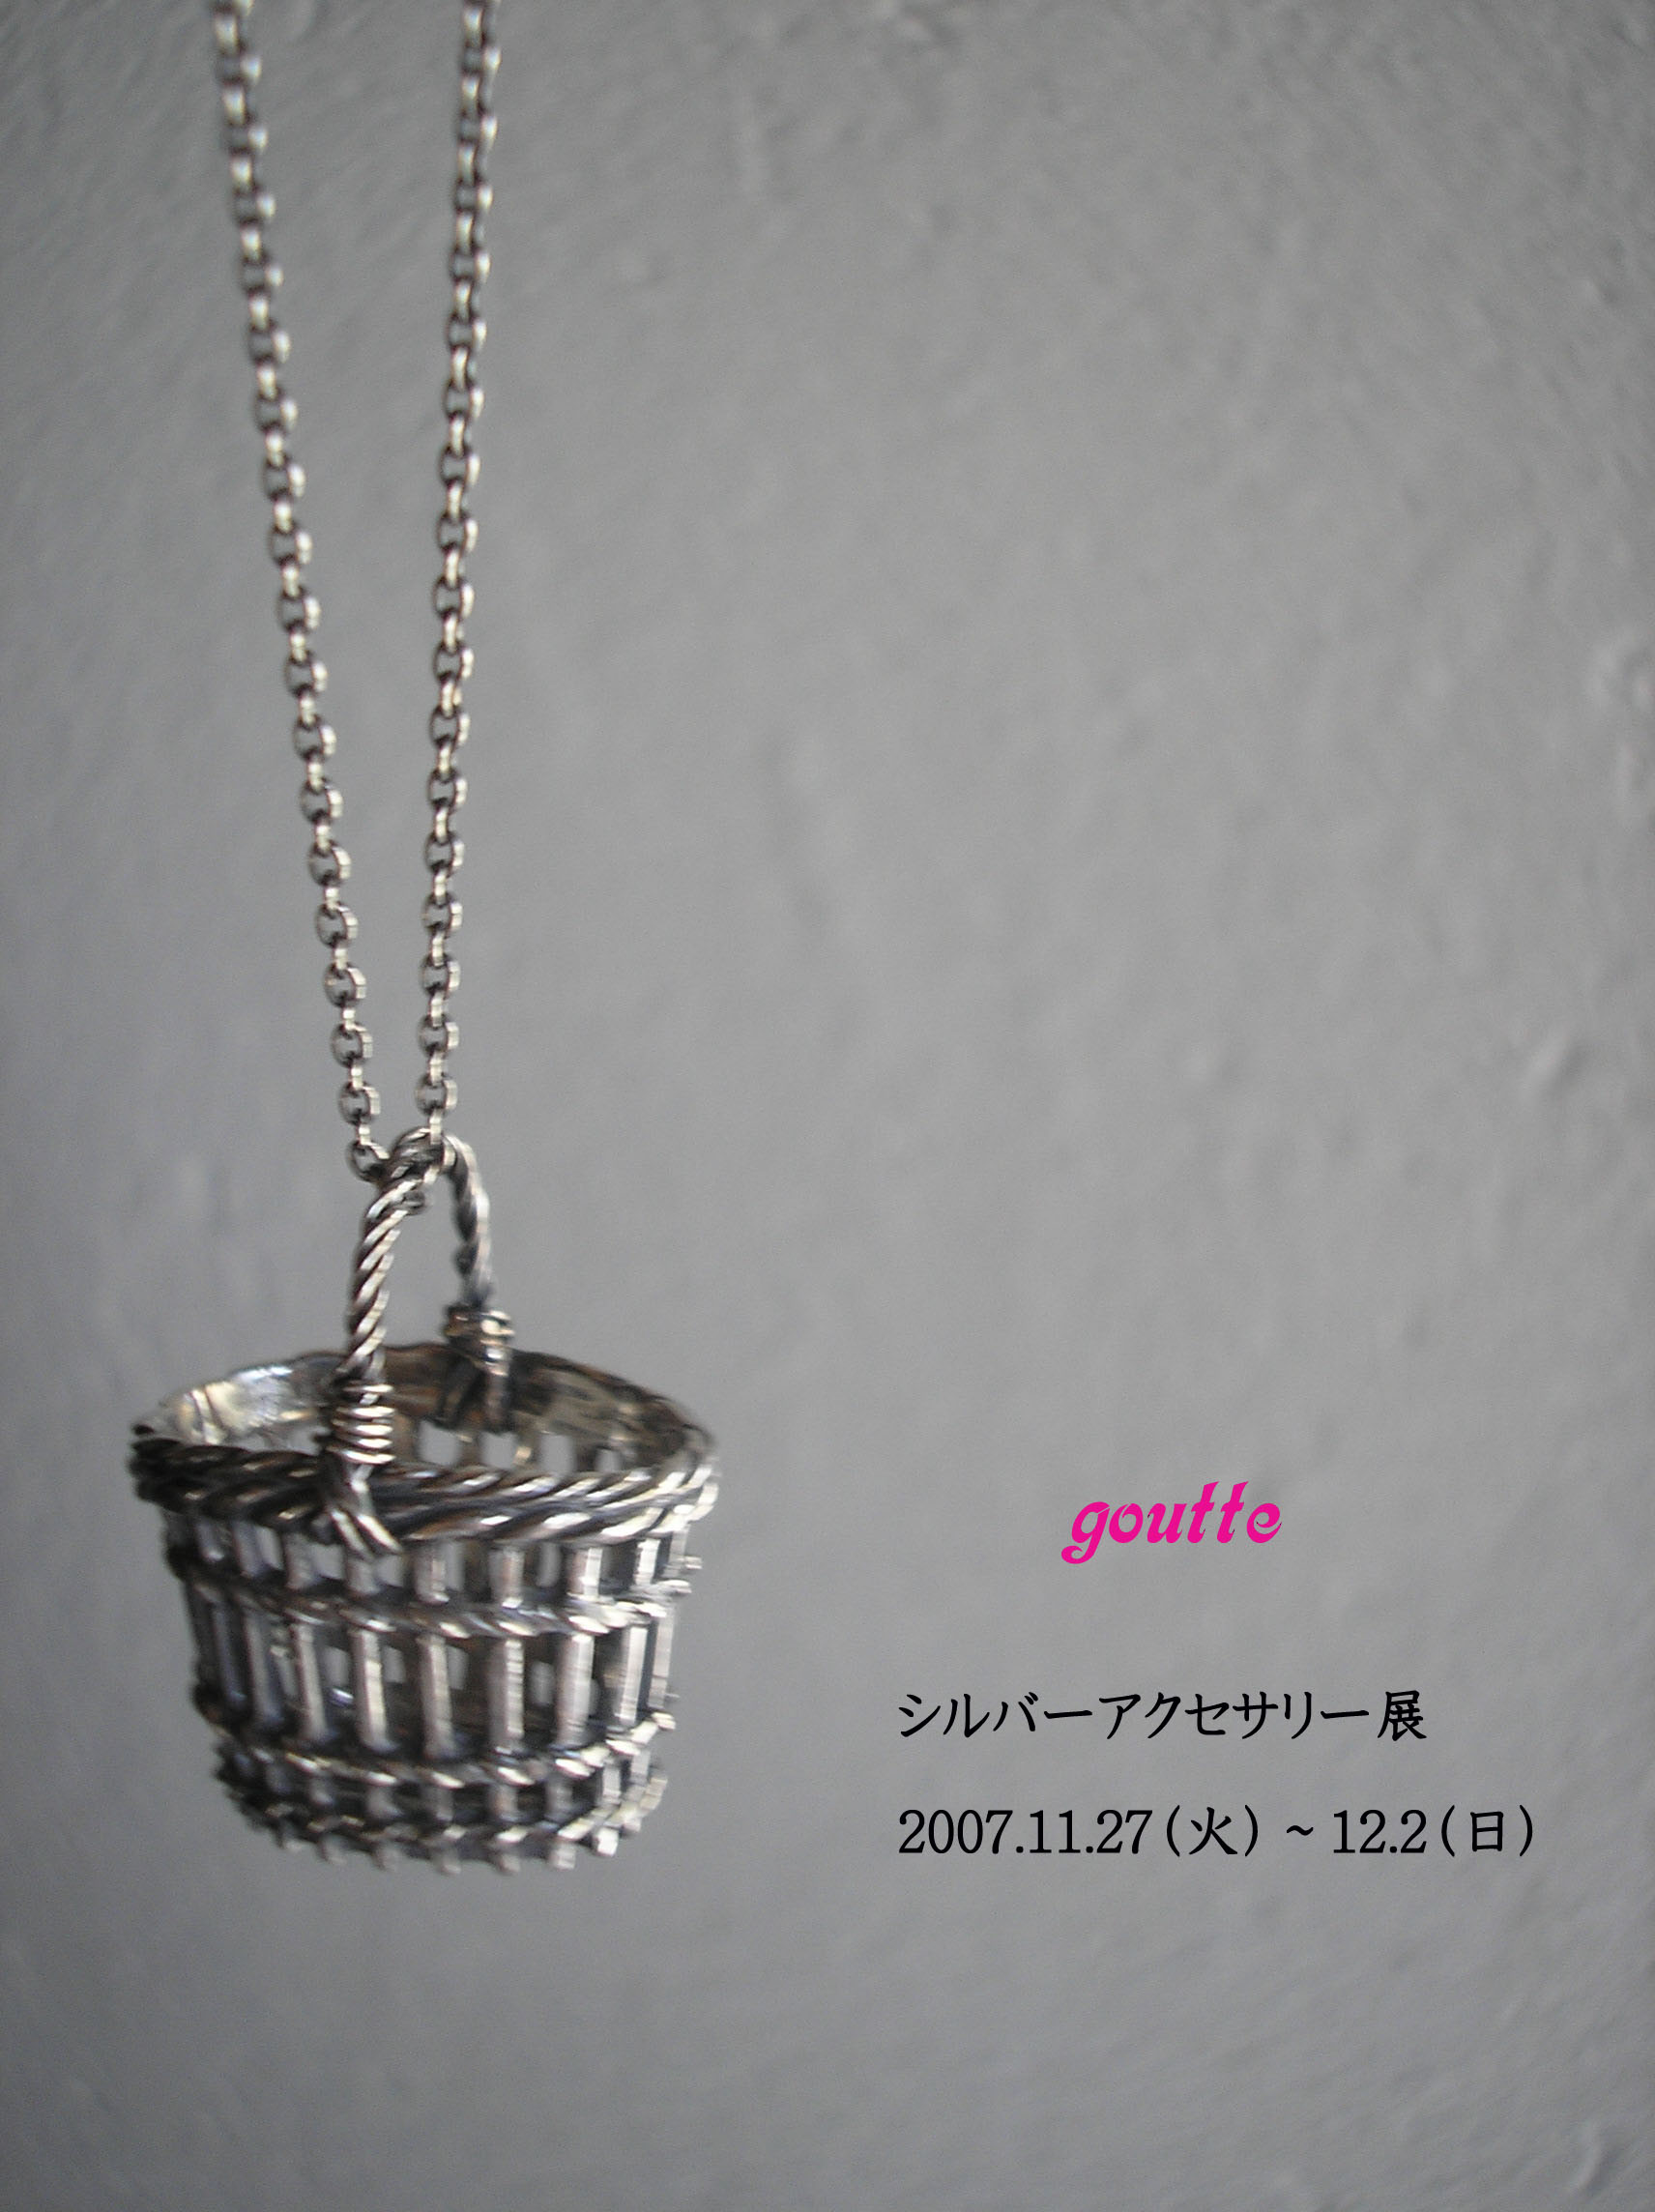 goutte シルバーアクセサリー展_c0176085_22364511.jpg